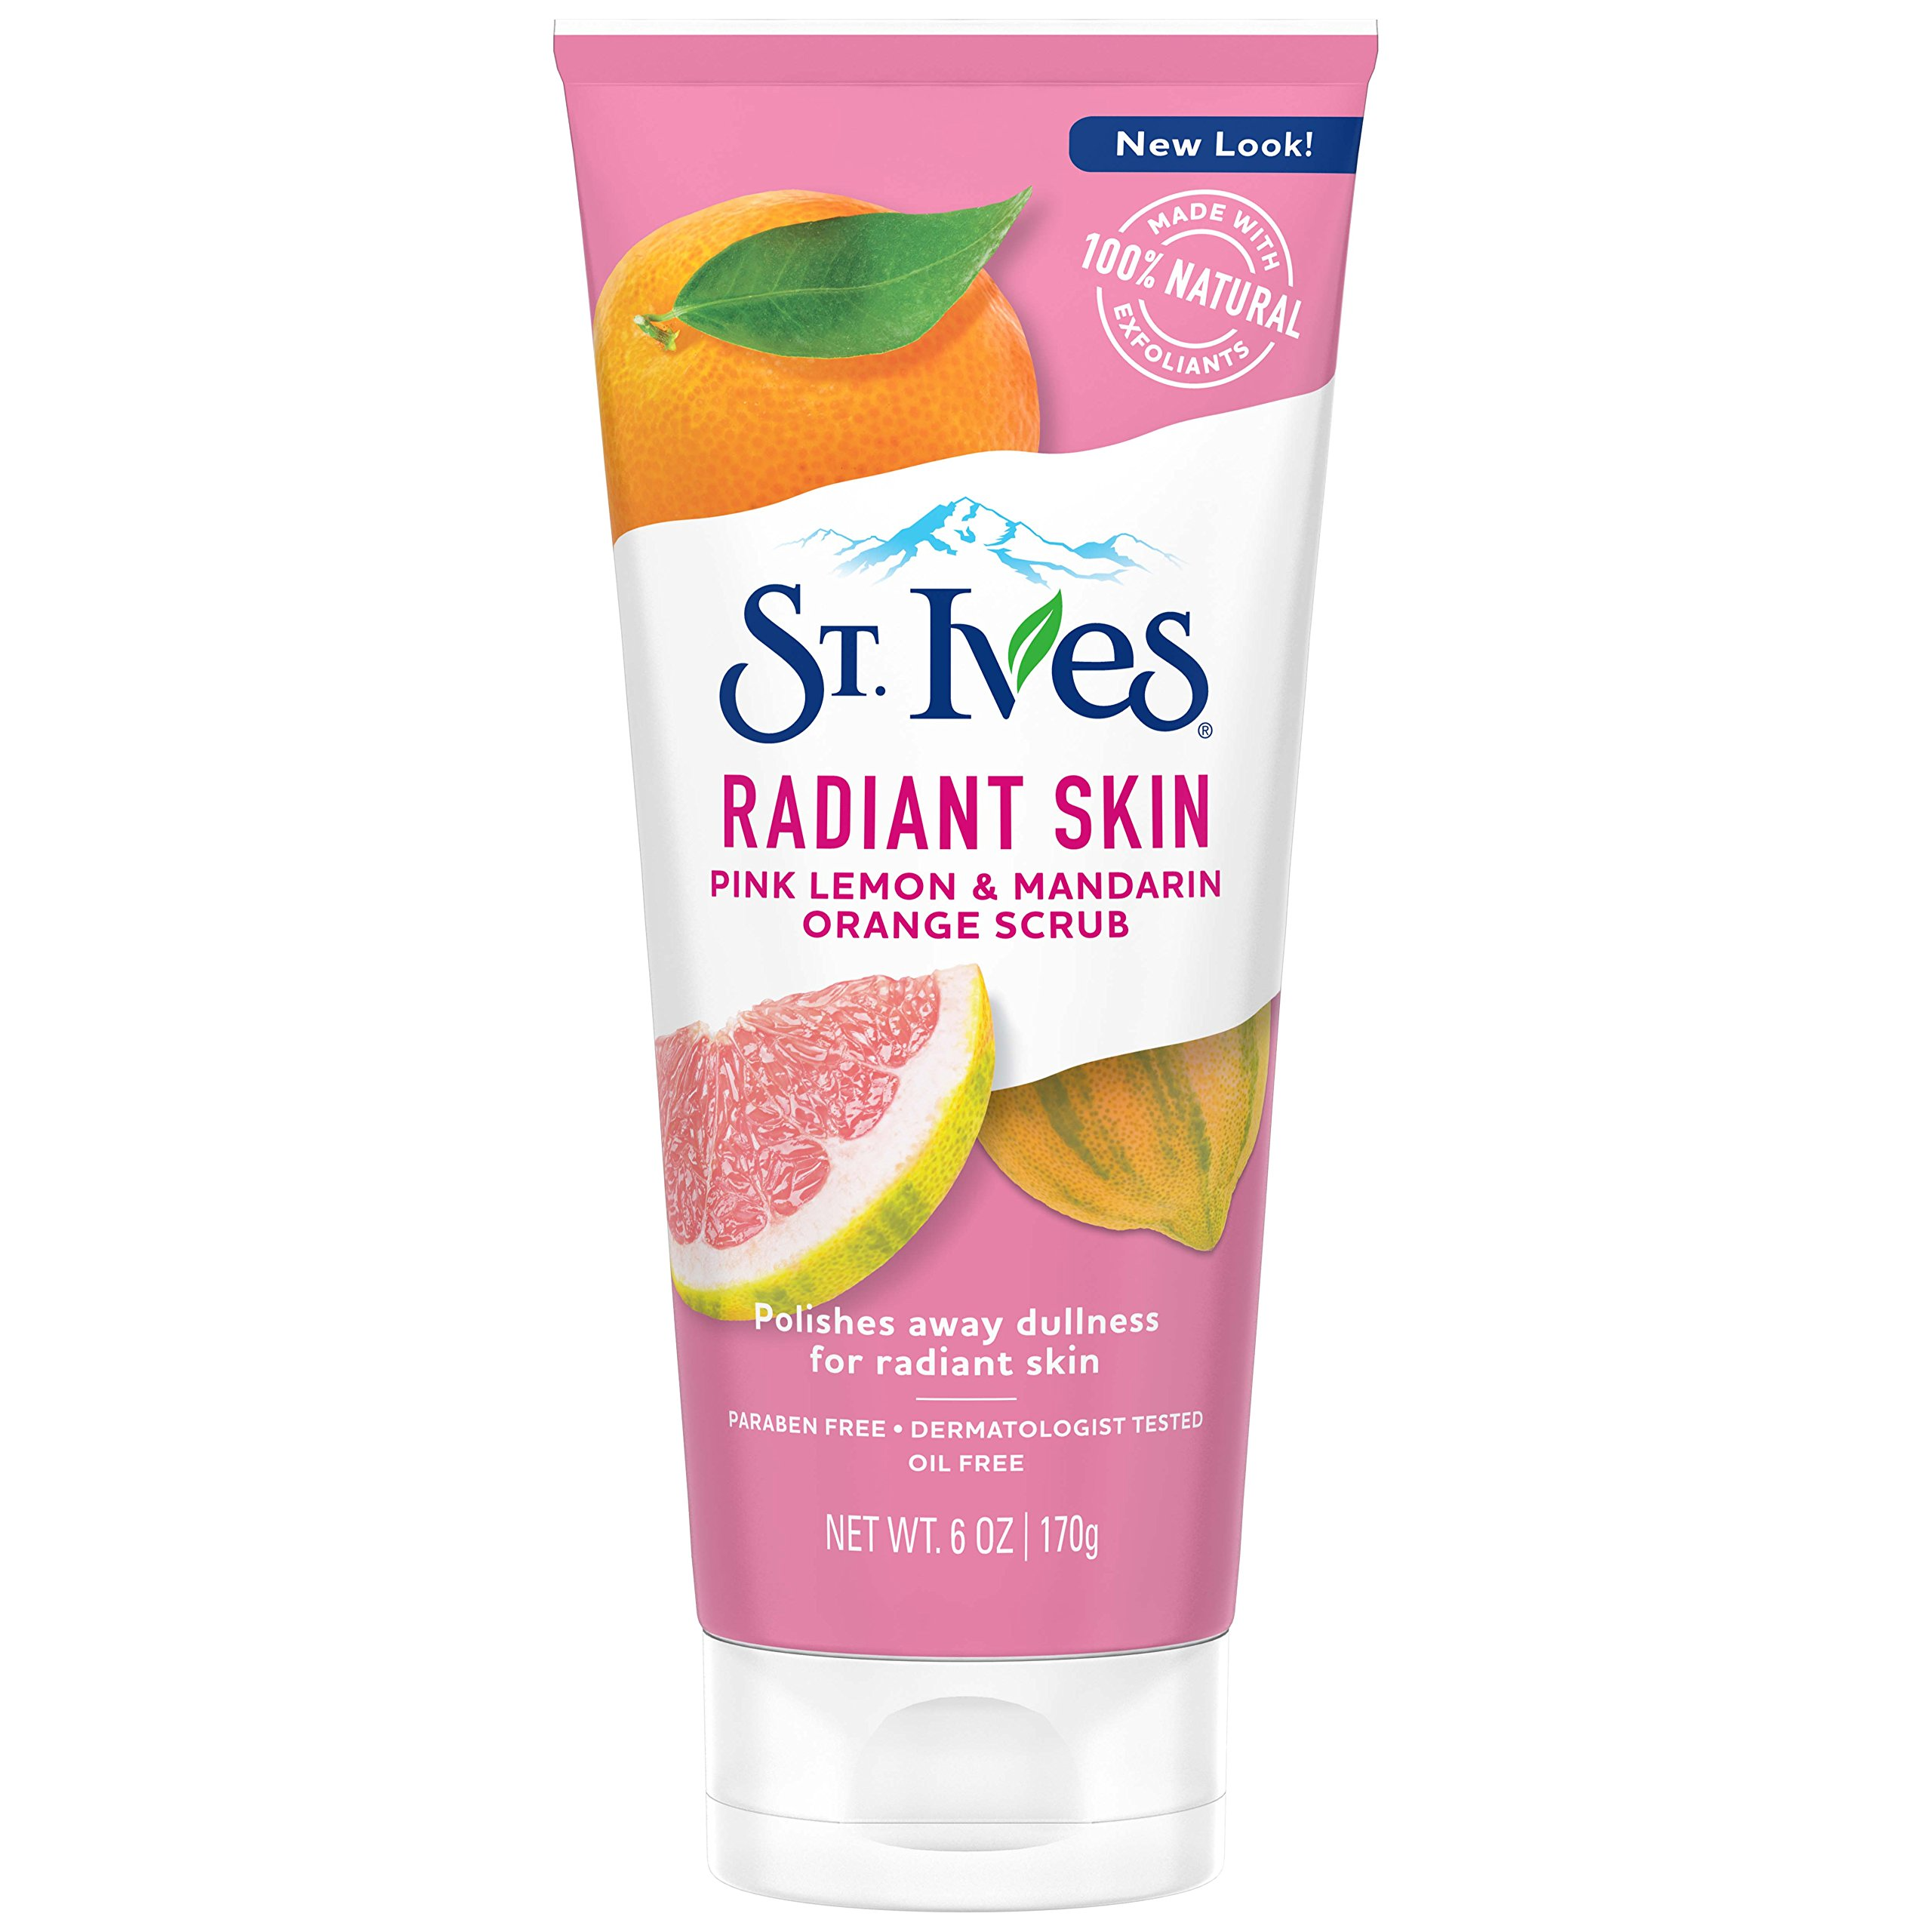 St. Ives Radiant Skin Face Scrub, Pink Lemon and Mandarin Orange, 6 oz